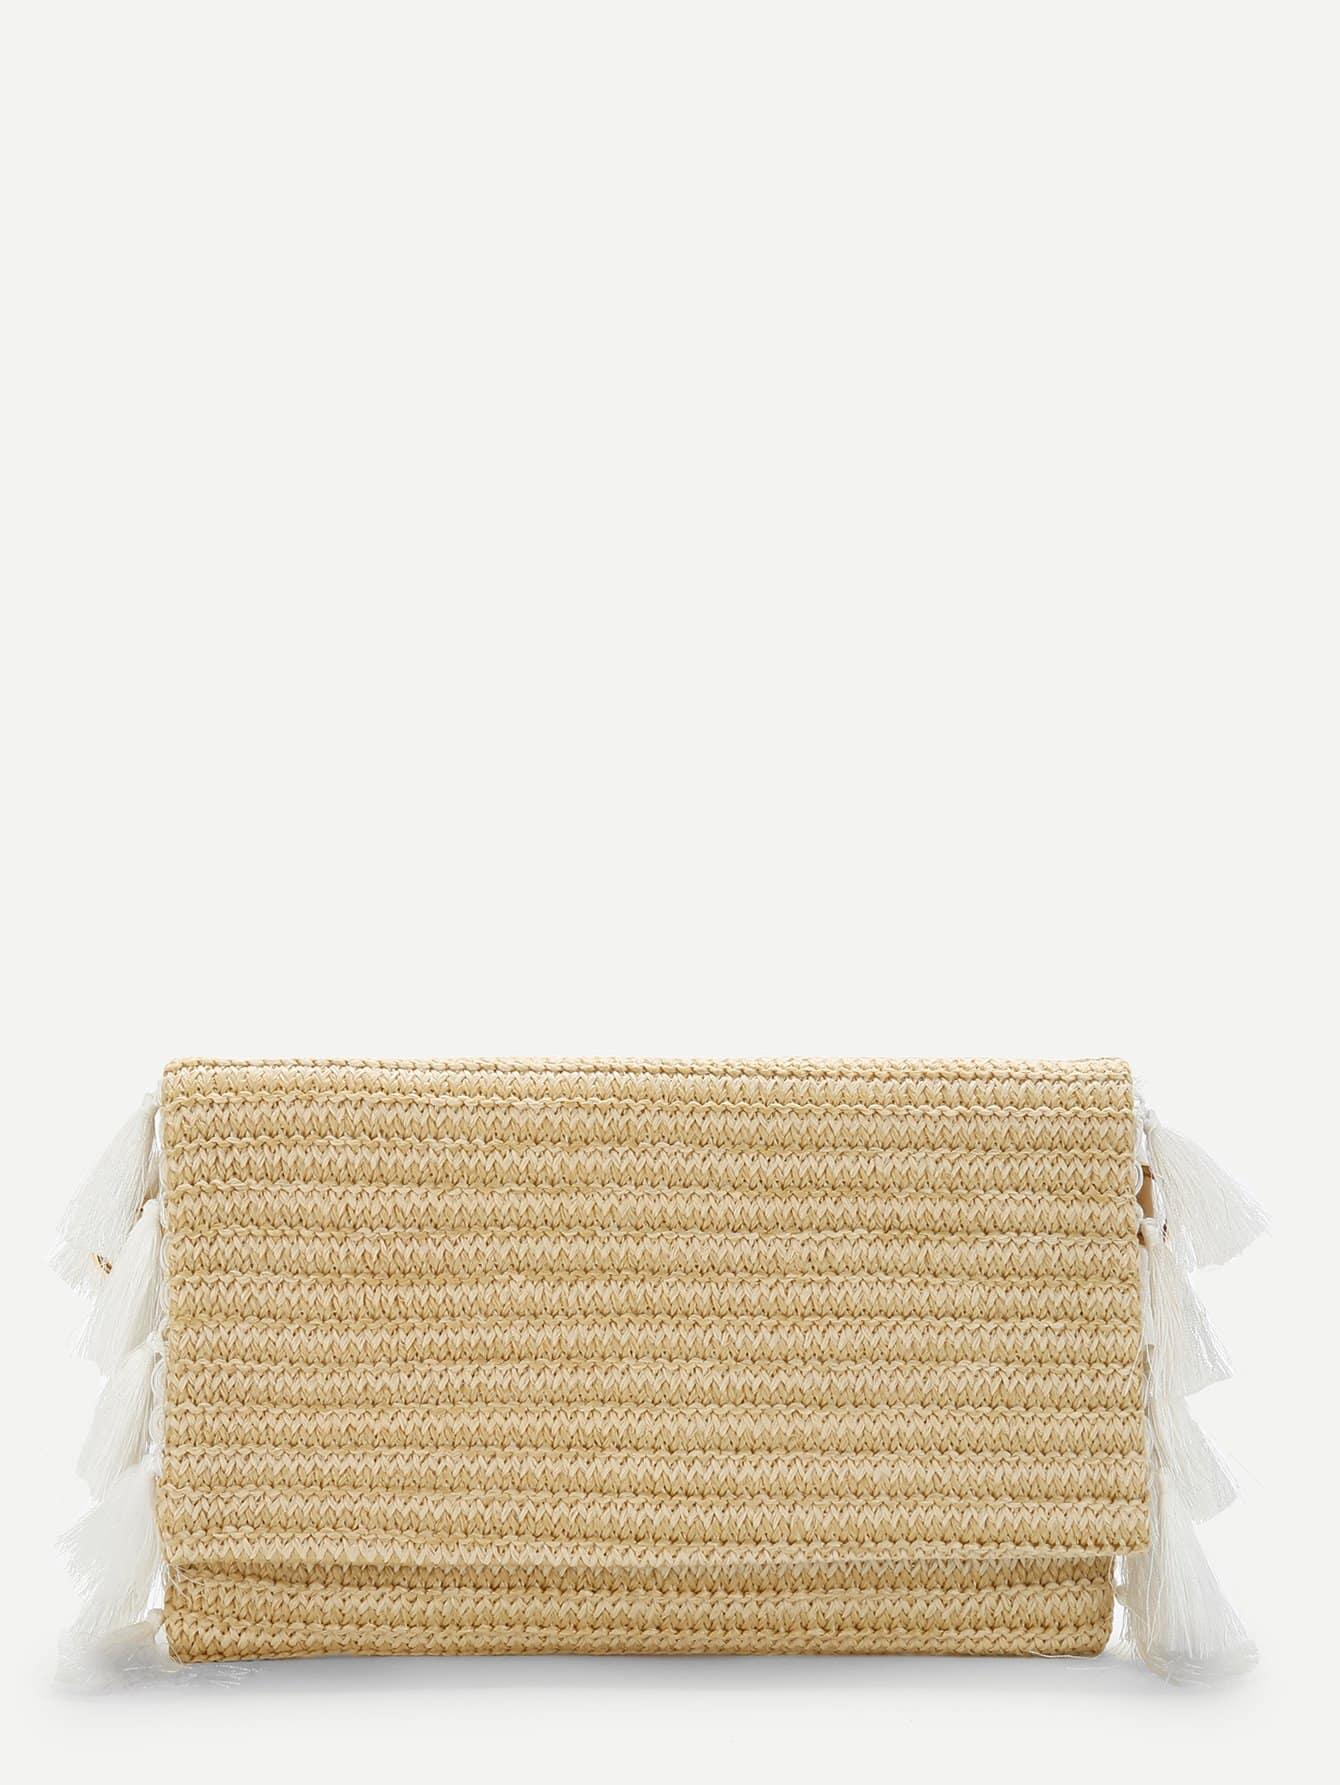 Tassel Detail Flap Straw Crossbody Bag beige tassel detail straw shoulder bags